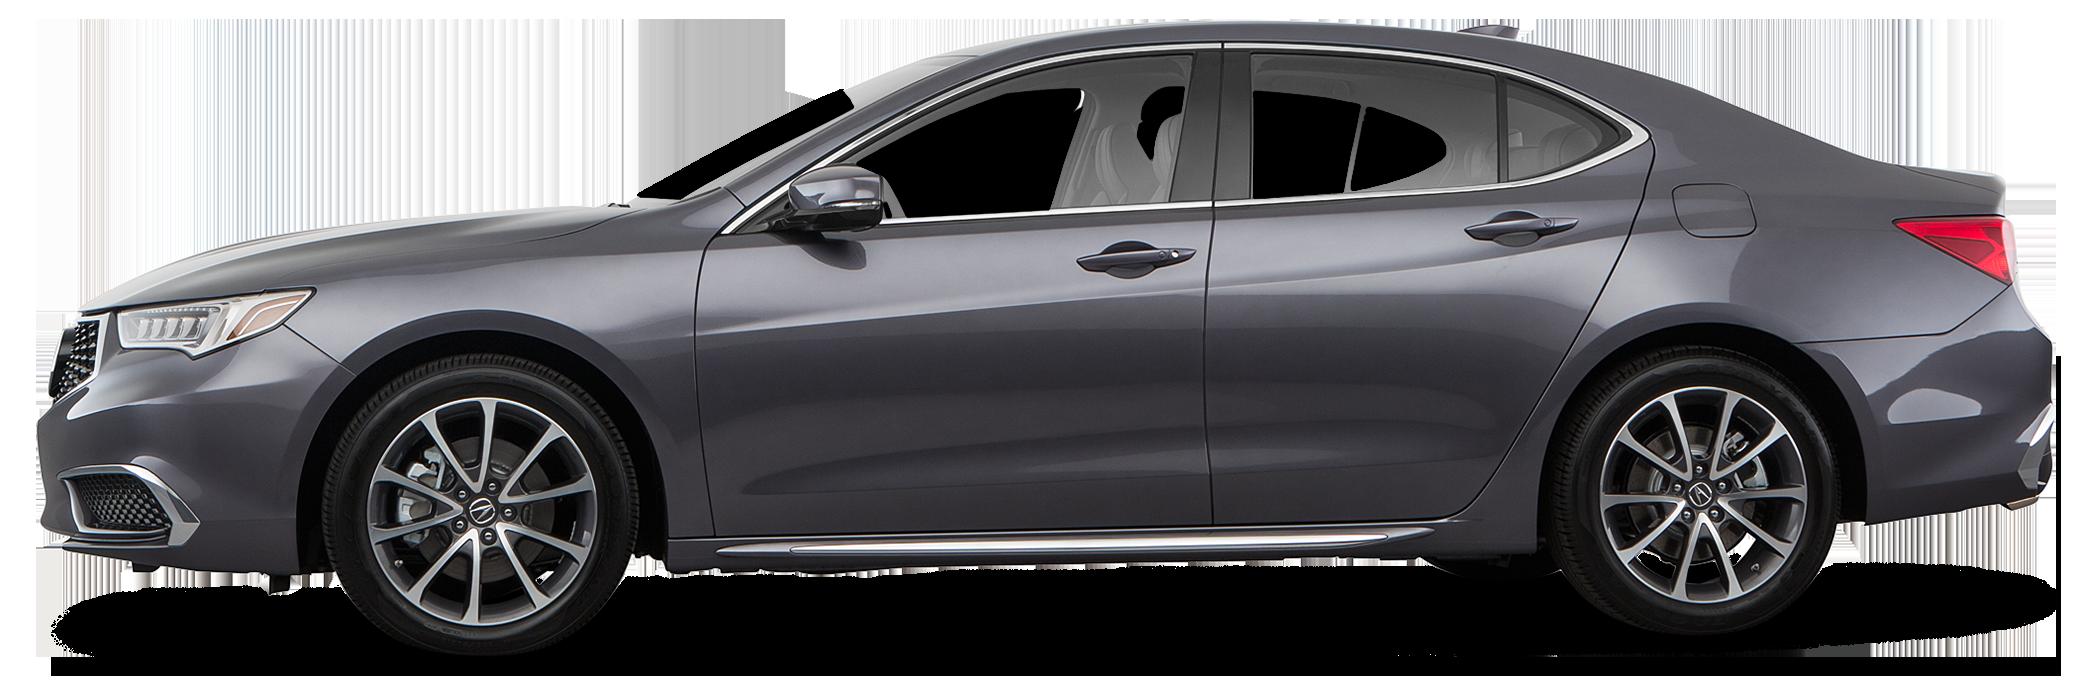 2019 Acura TLX Sedan V6